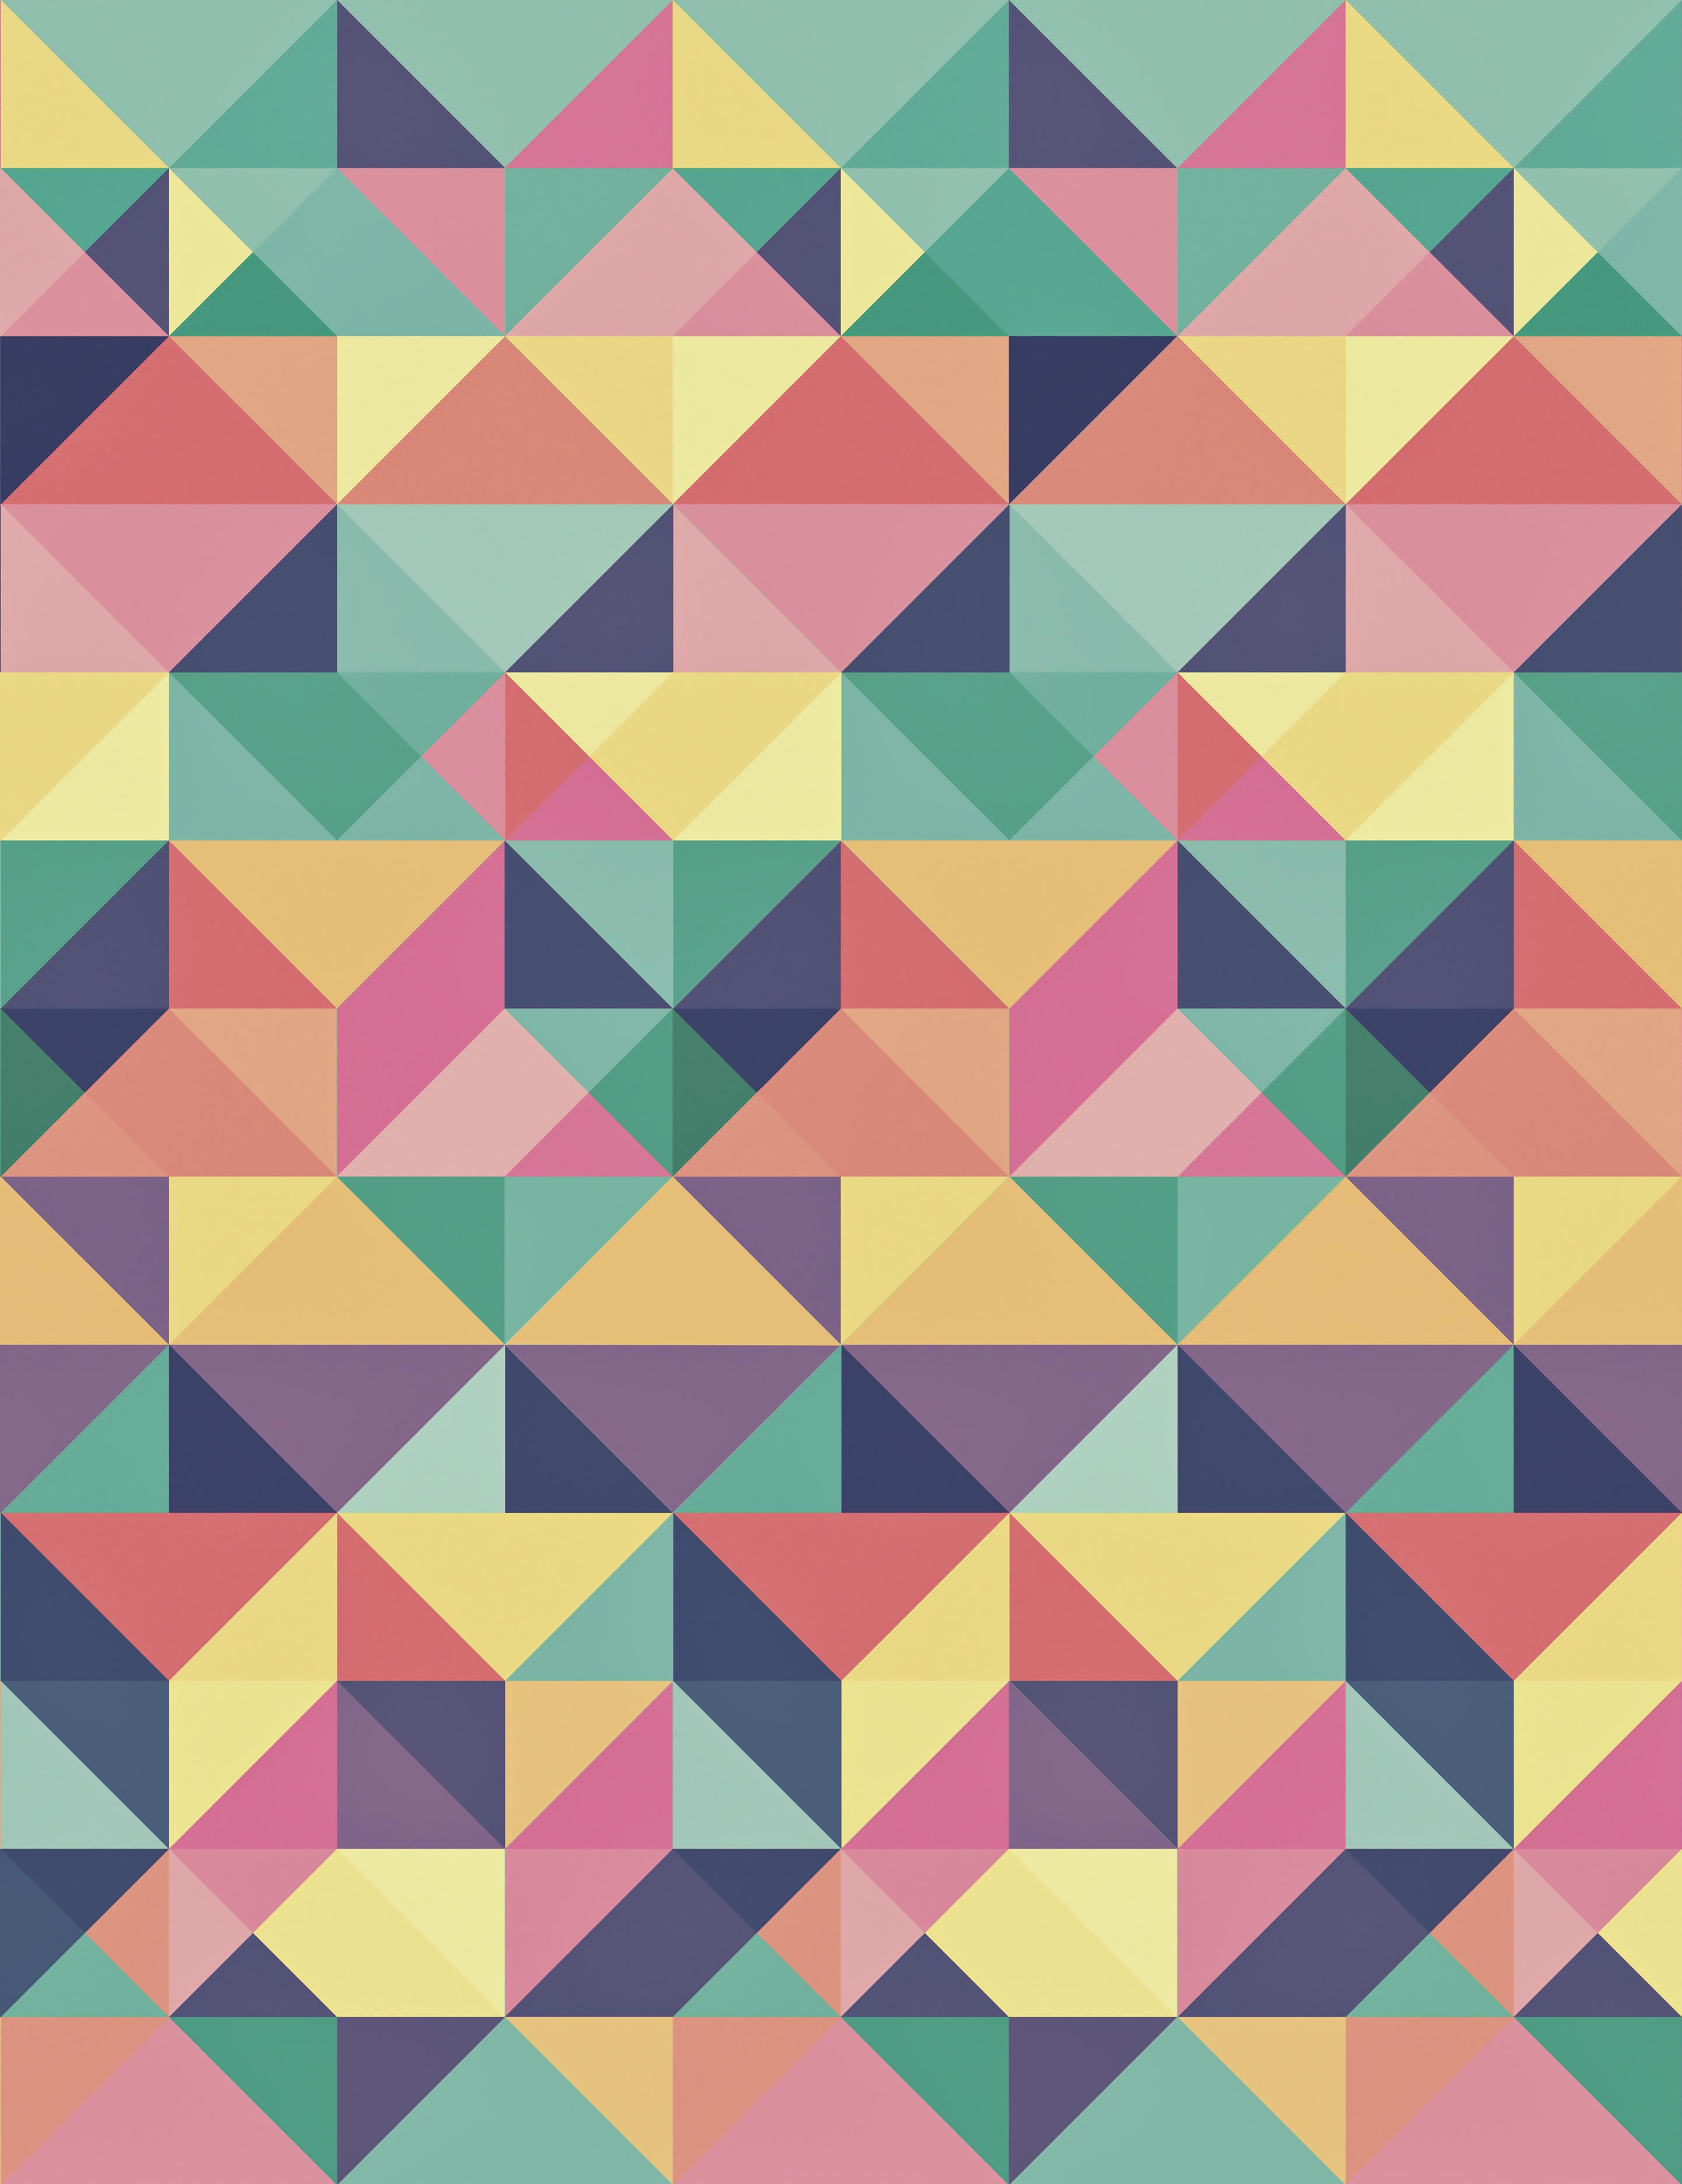 Pattern variation by absurdwordpreferred on deviantart for Pattern wallpaper for home